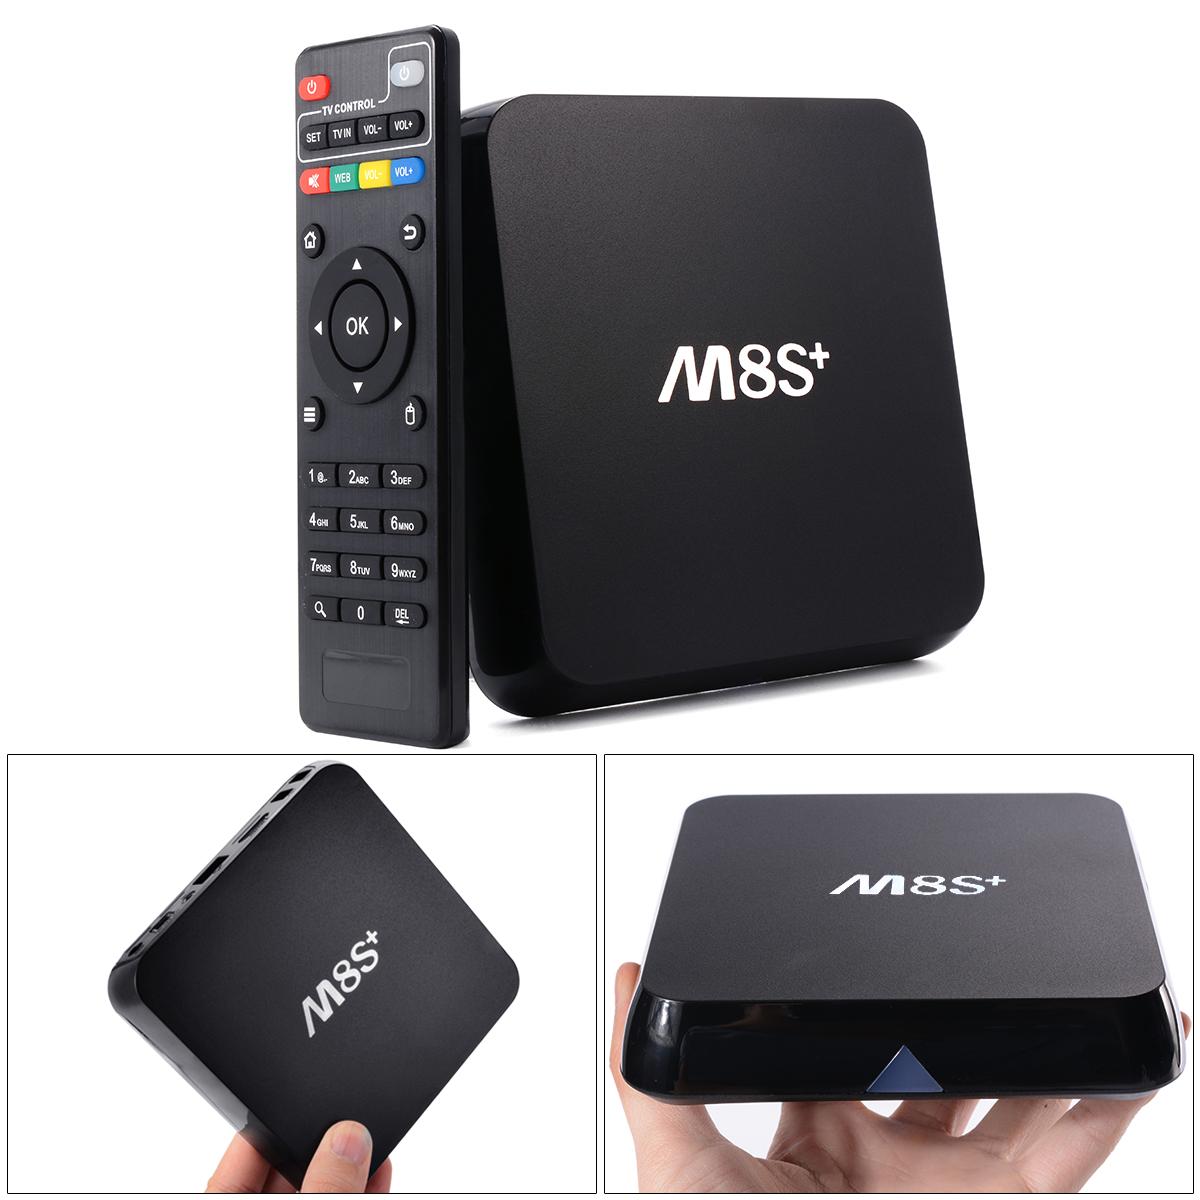 M8S Plug/M8S+ Android 5.1 TV Box Amlogic S812 Quad Core 2.4G 5G Wifi 2GB/8GB KODI Media Player Pre-install 4K H.265 BT 4.0 AH141(China (Mainland))